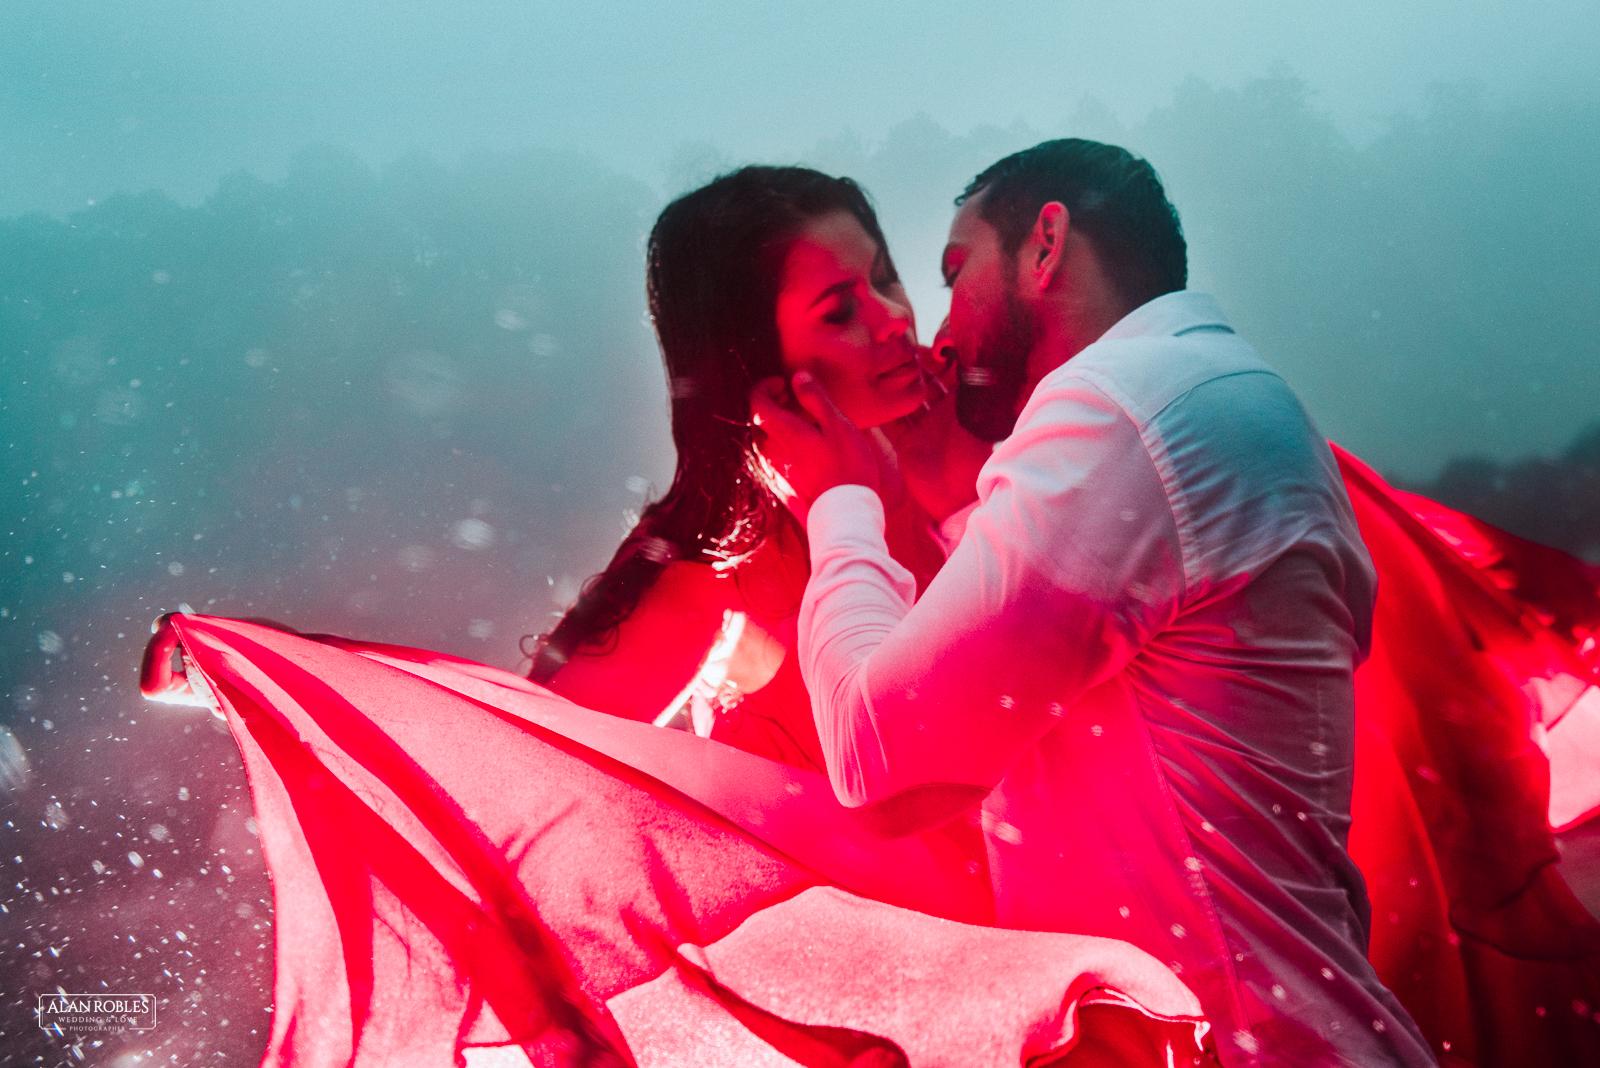 Fotografo de bodas Alan Robles-Pre boda Chiapas-20